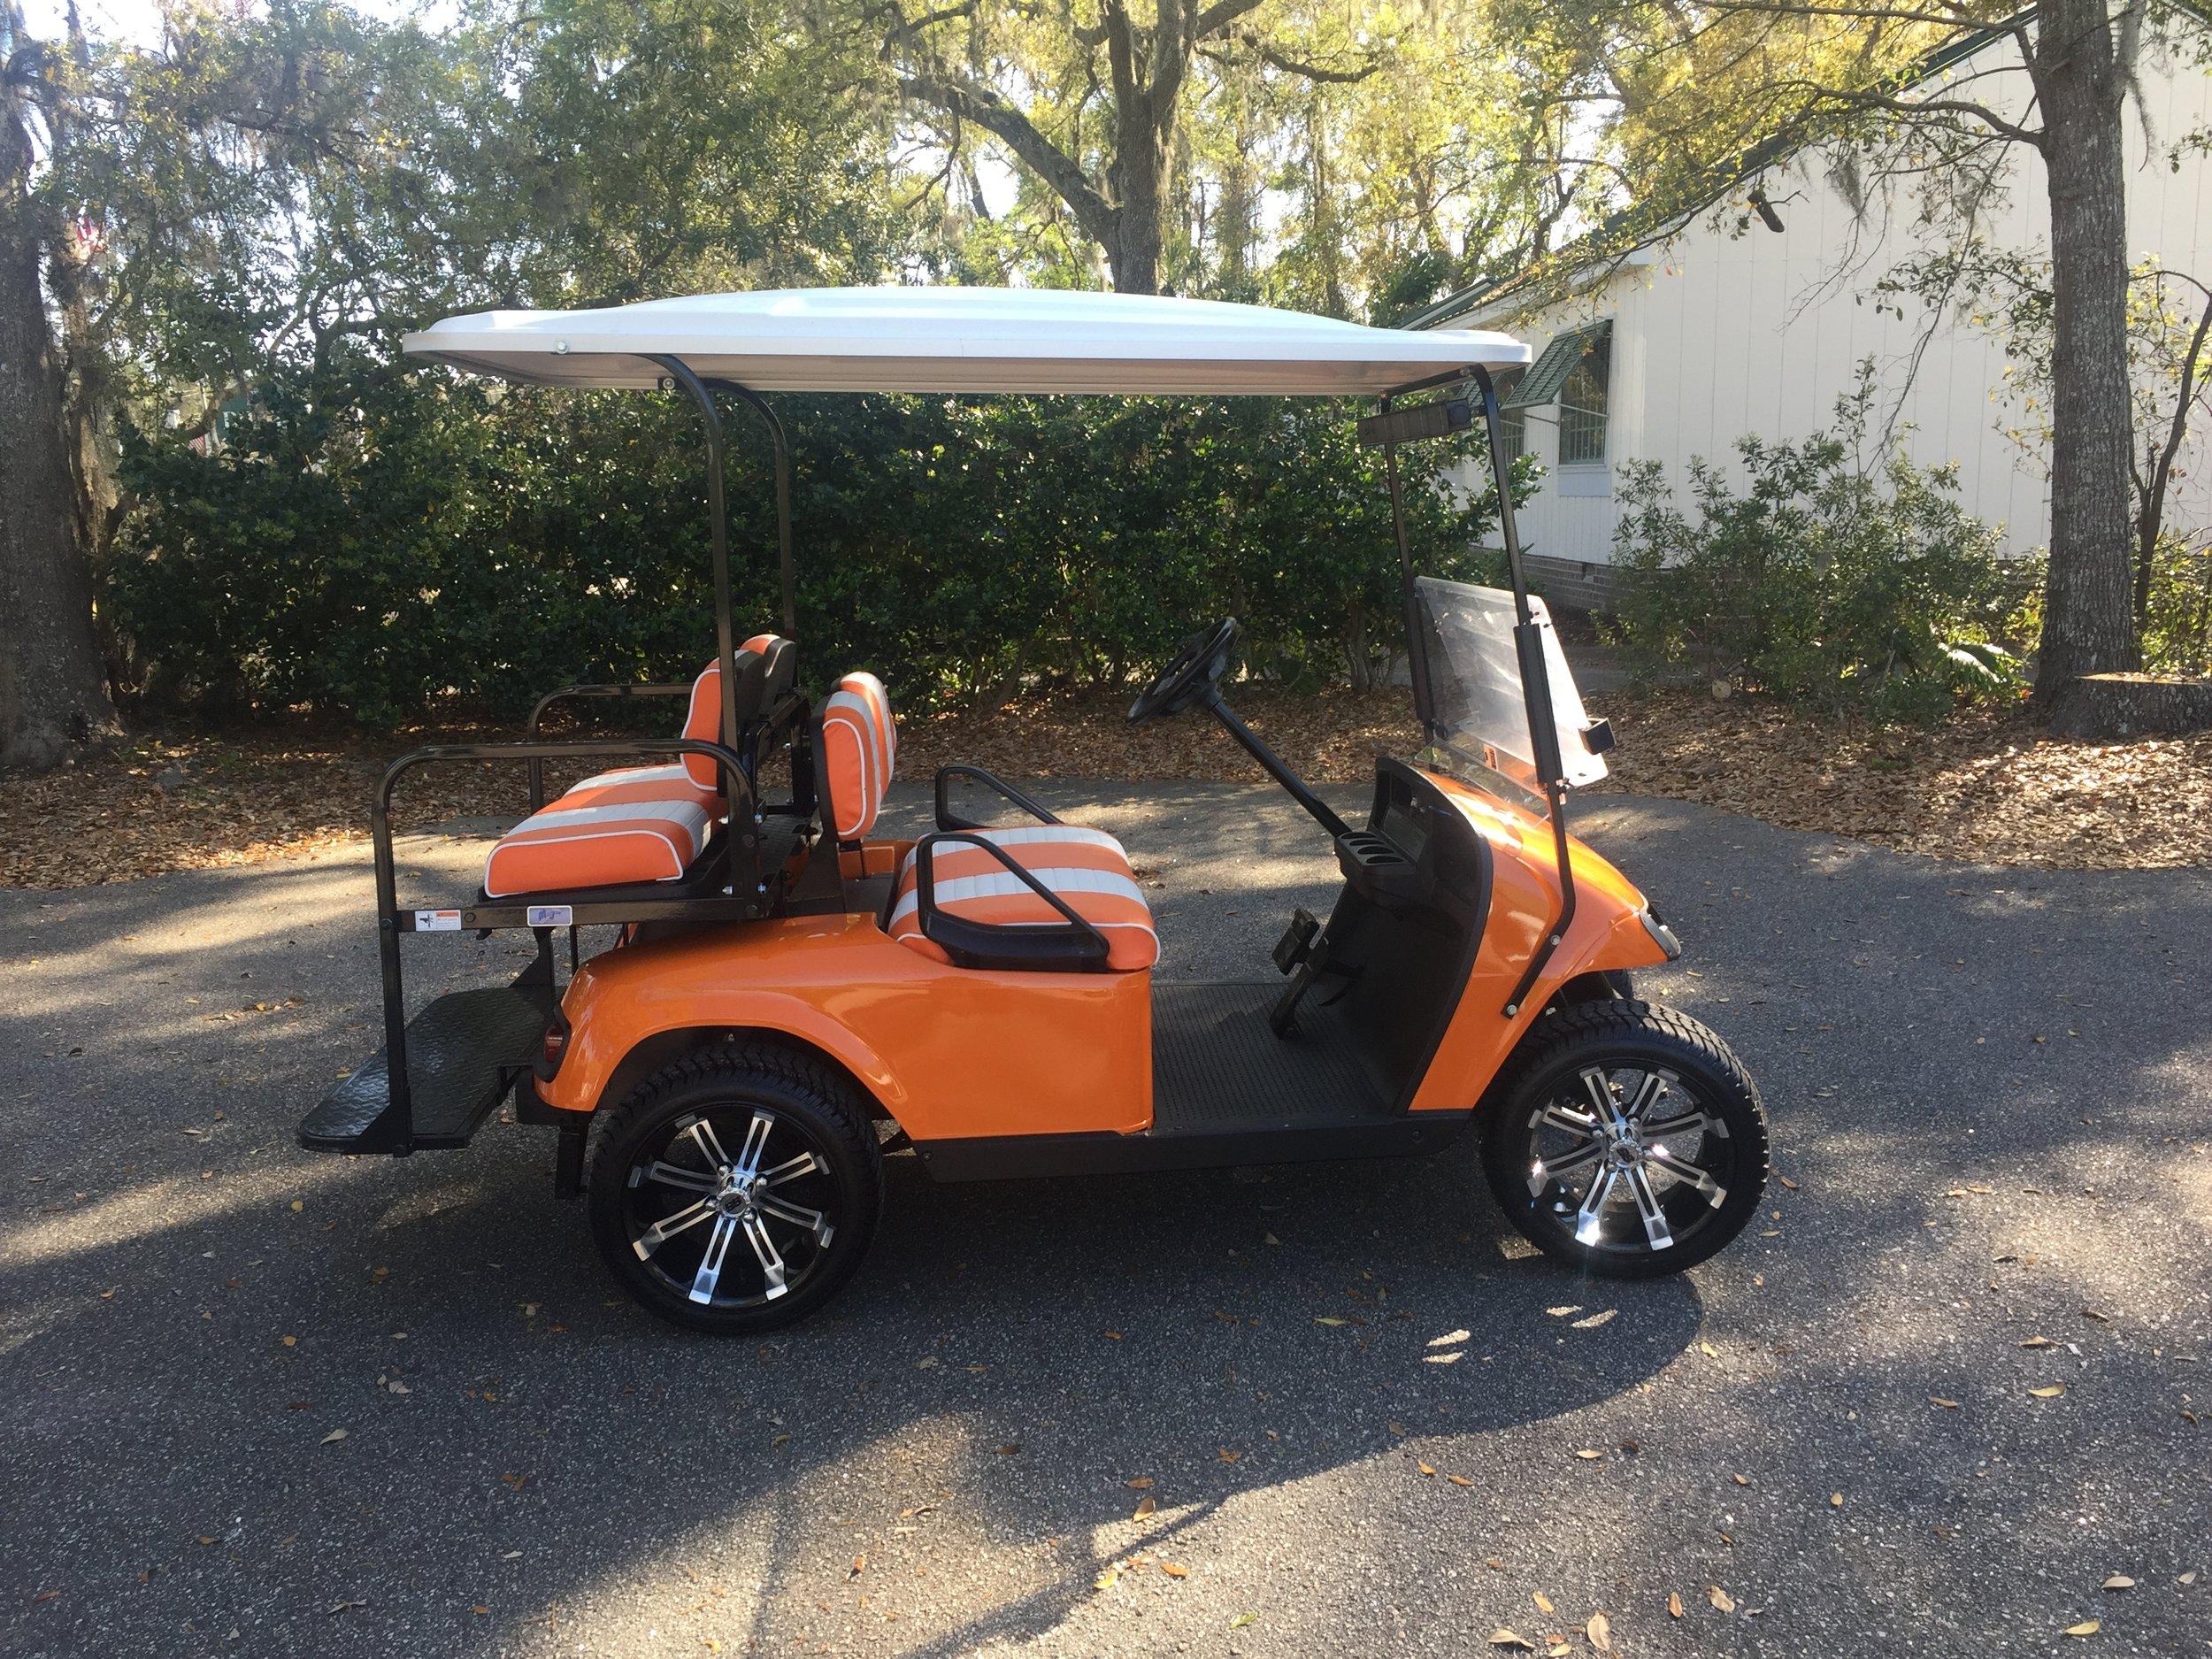 2015 Orange EZGO Cart —————   Orange/white seats, white extended top, new 2019 batteries 48vt (6-8), high speed code, LED lights, Lo Pro tires, mirror & flip windshield